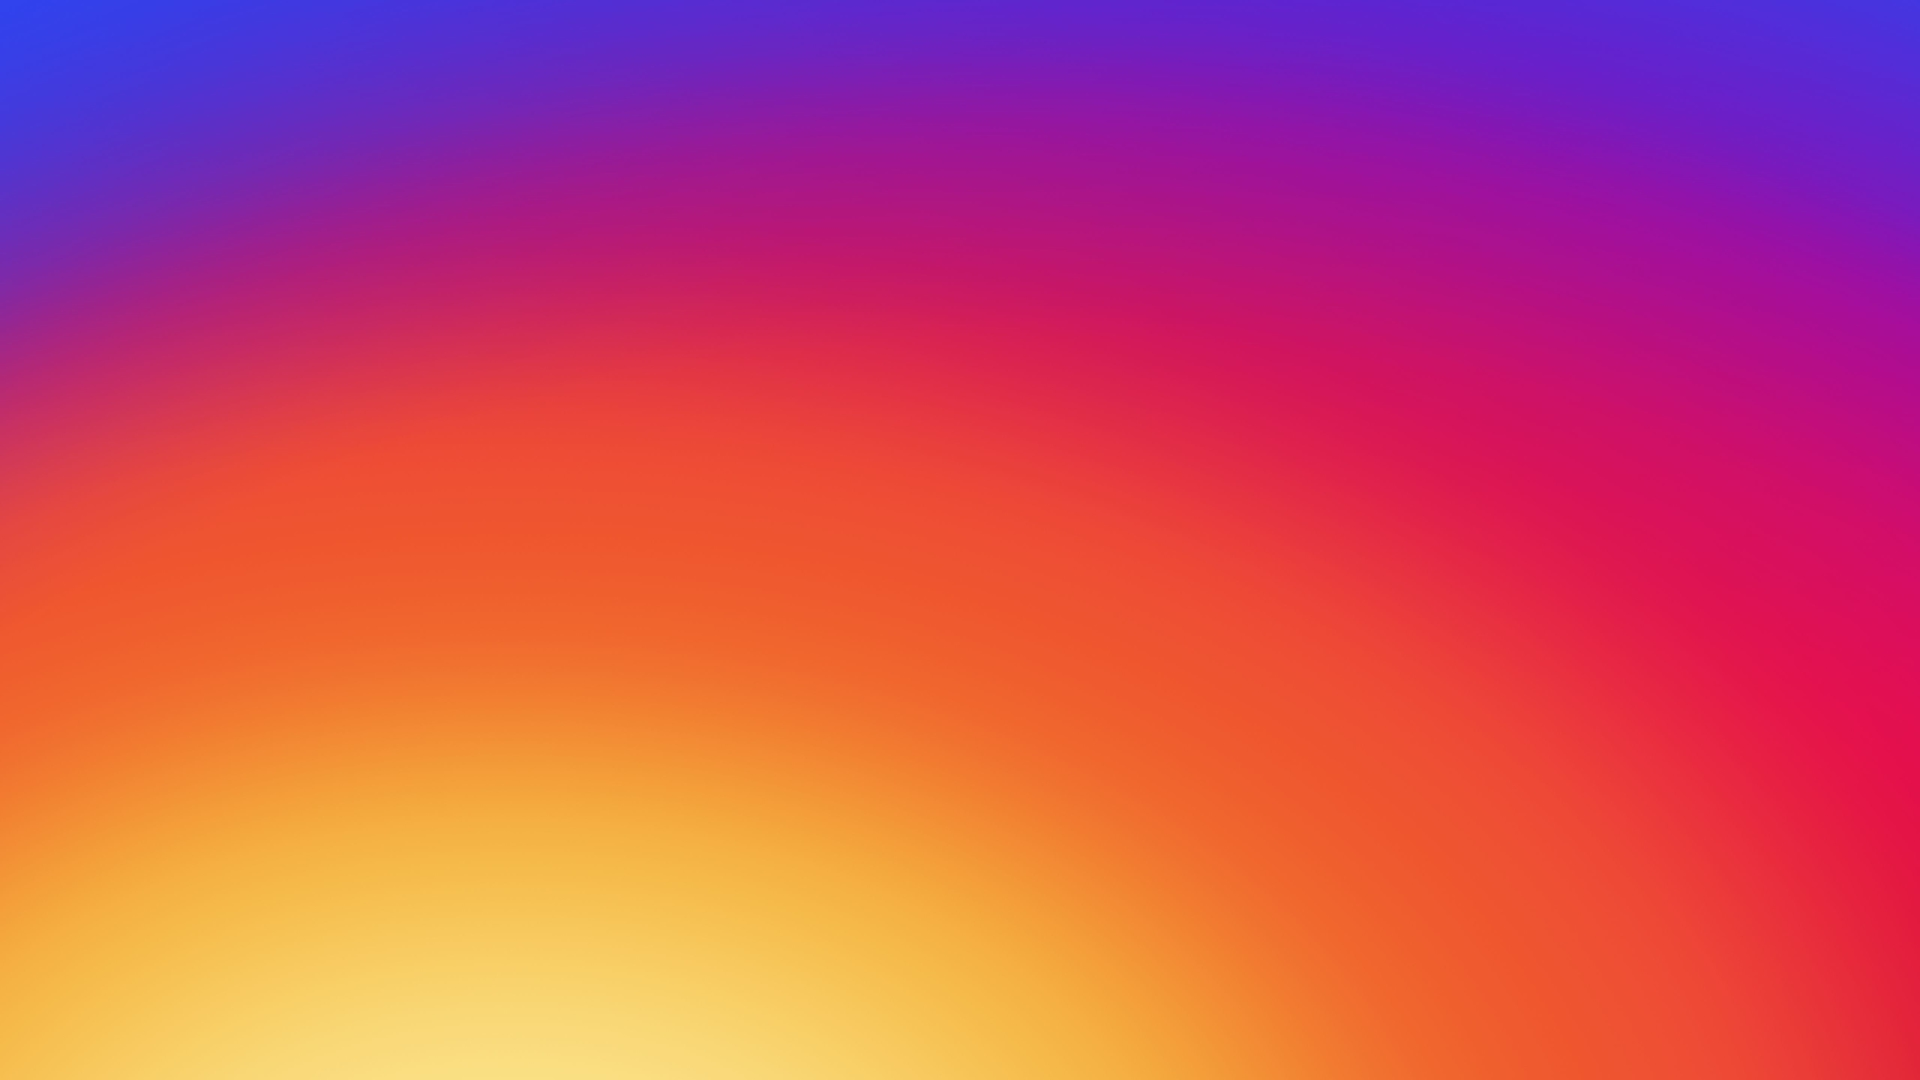 1920x1080 Instagram Gradient 1080p Laptop Full Hd Wallpaper